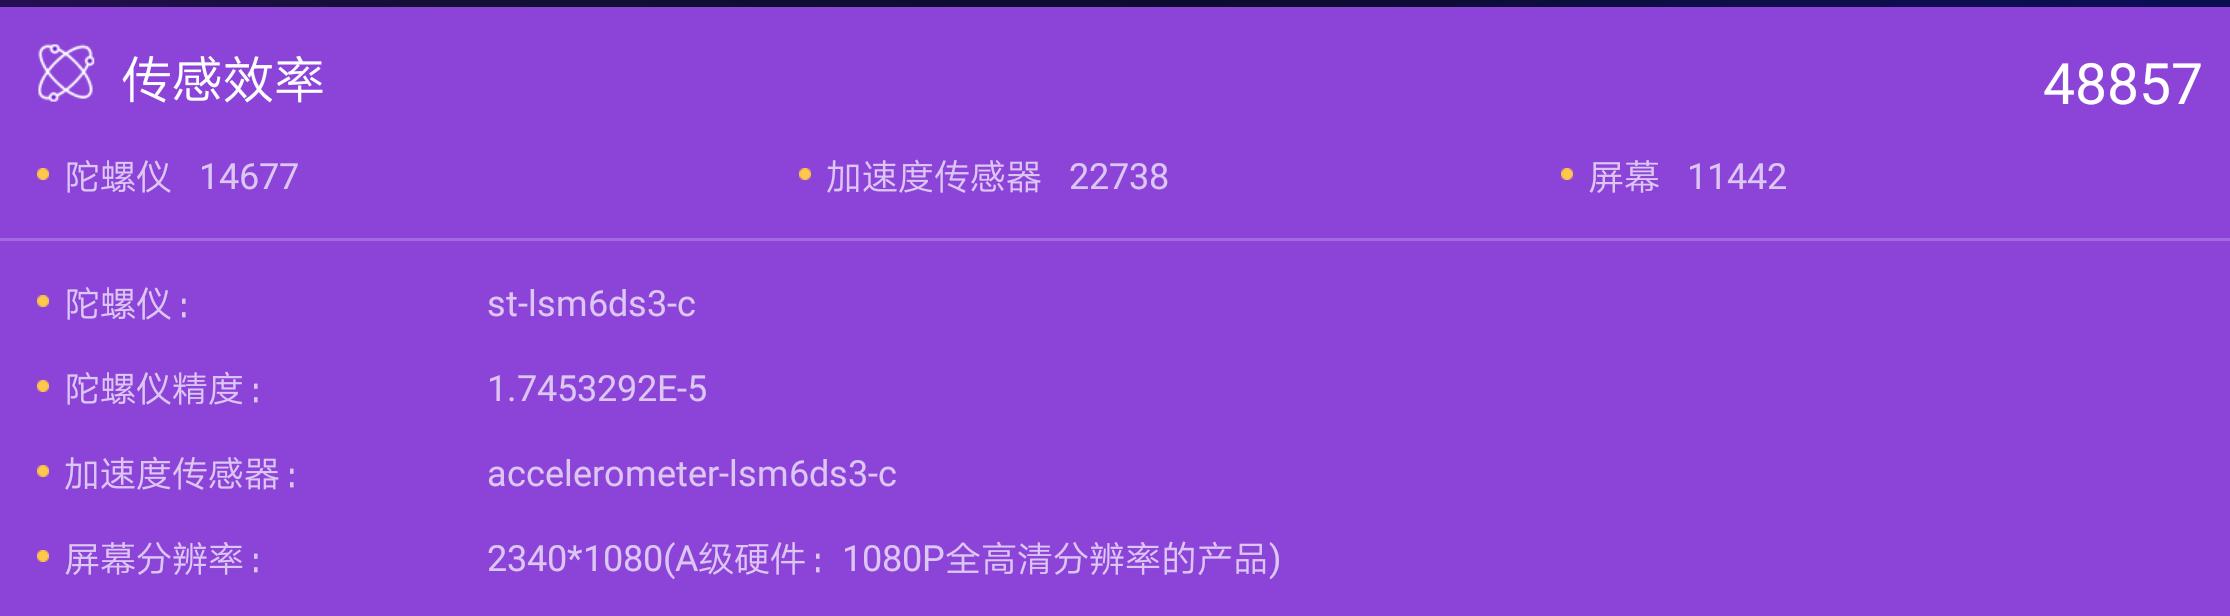 Screenshot_20190106_210152_com.ludashi.vrbench.png